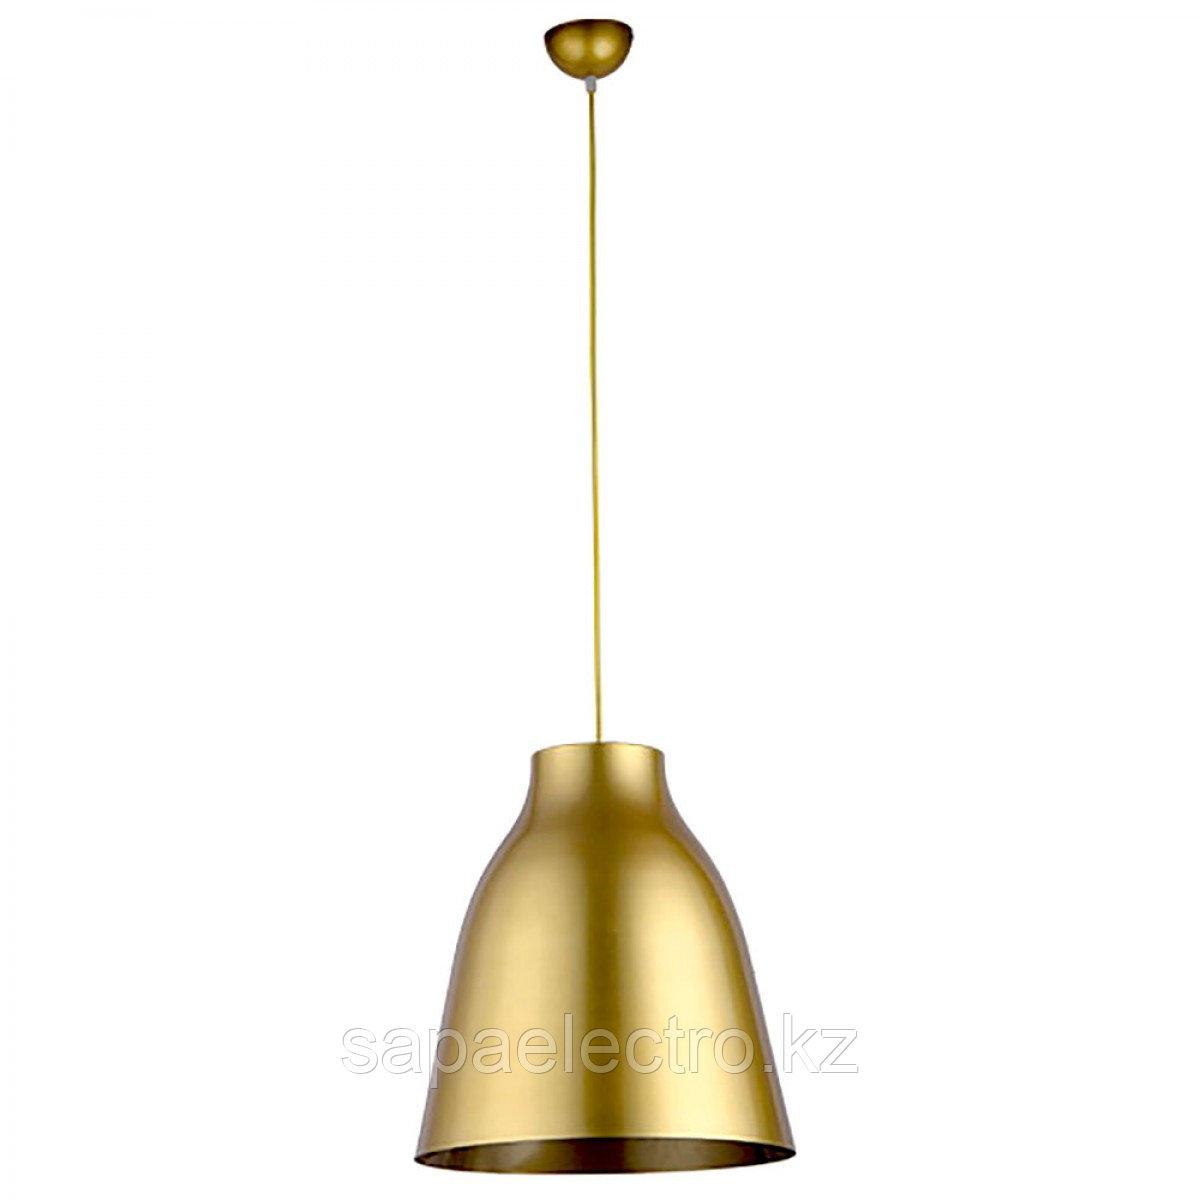 Свет-к SL005 GOLD E27 100W (TEKSAN) 5шт